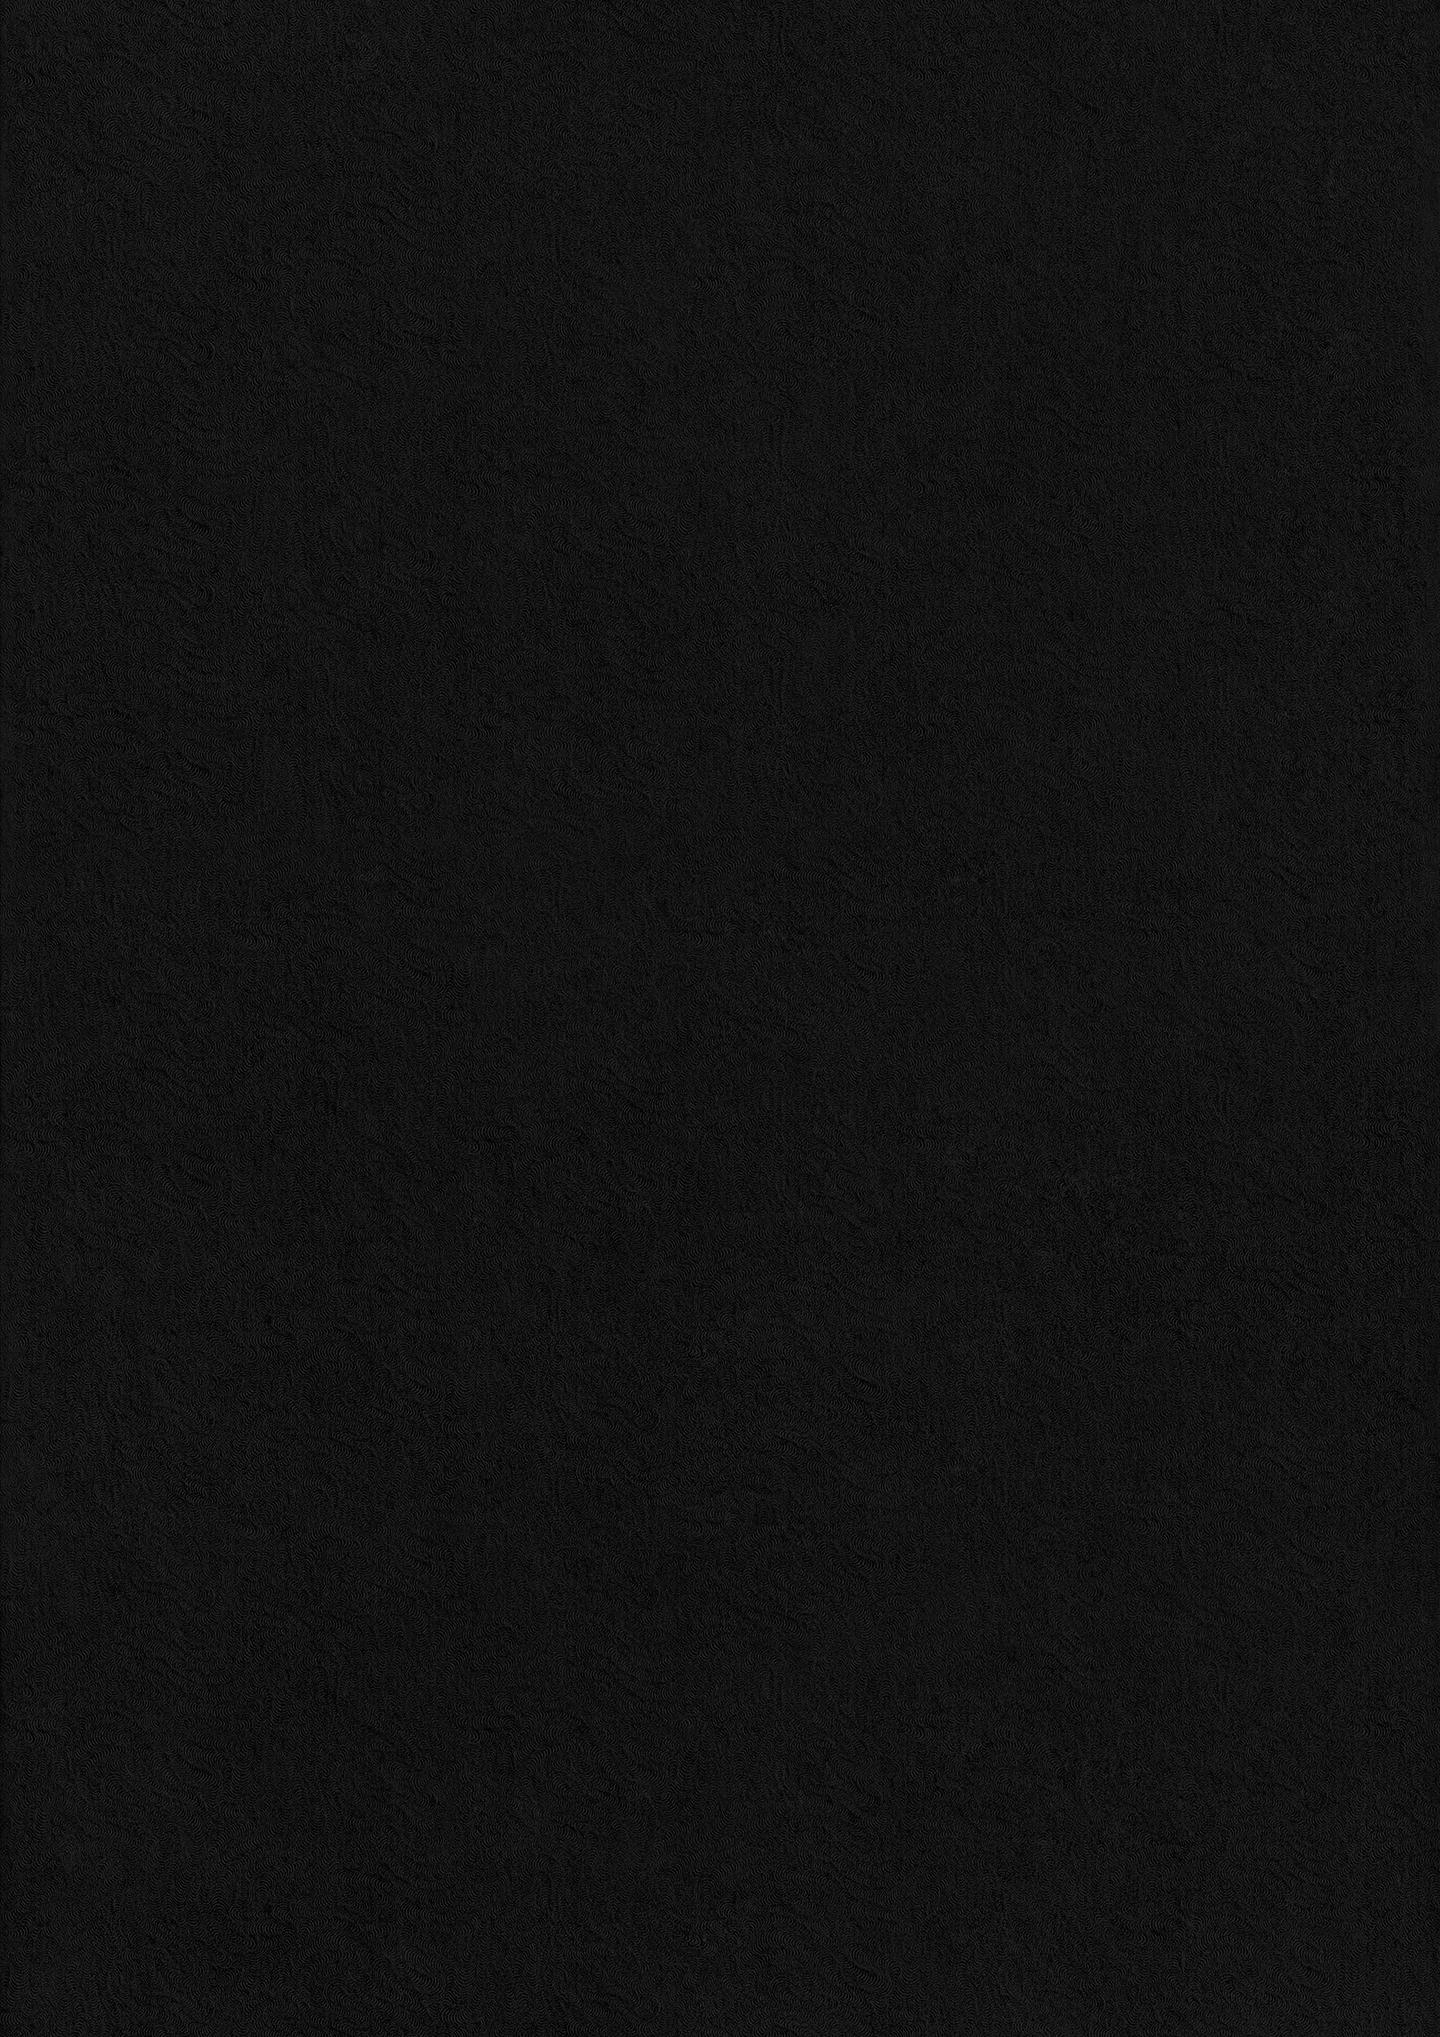 26 Black Paper Textures World